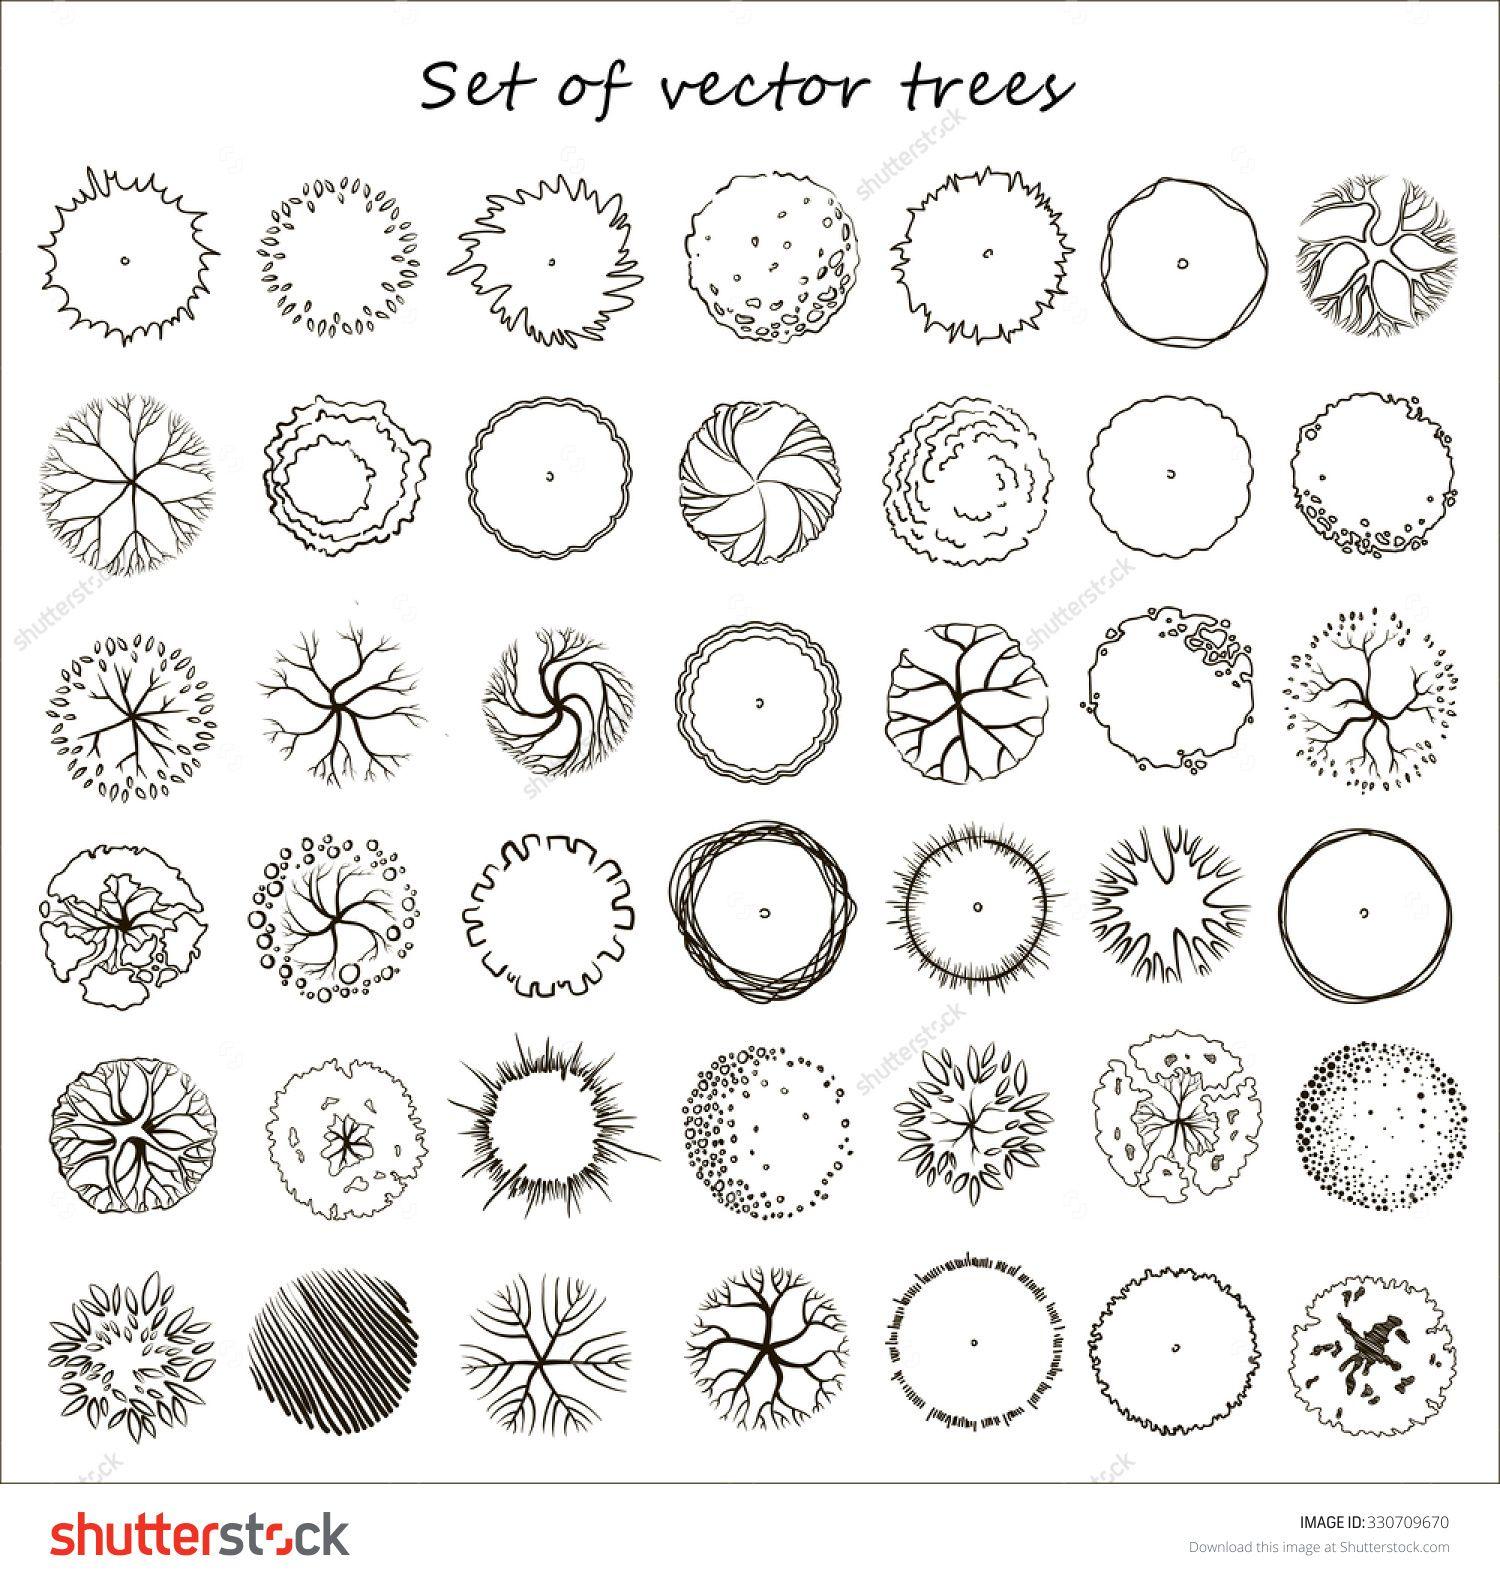 Tree Plan Silhouette Vector